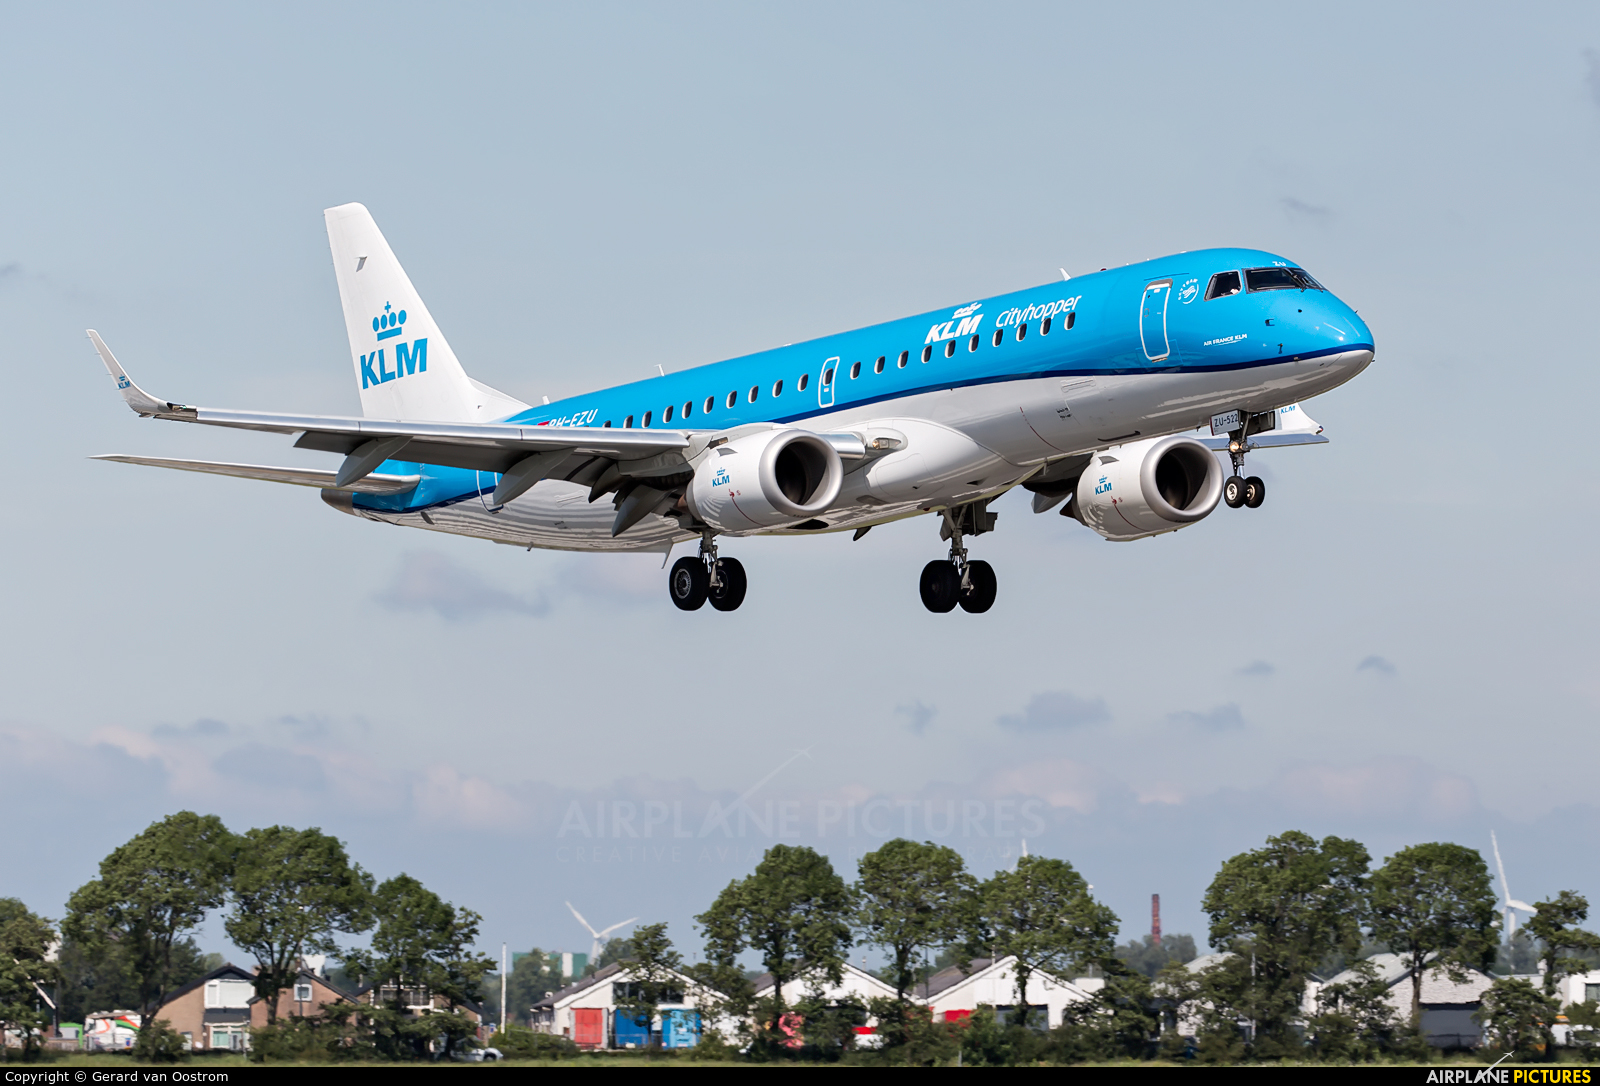 KLM Cityhopper PH-EZU aircraft at Amsterdam - Schiphol